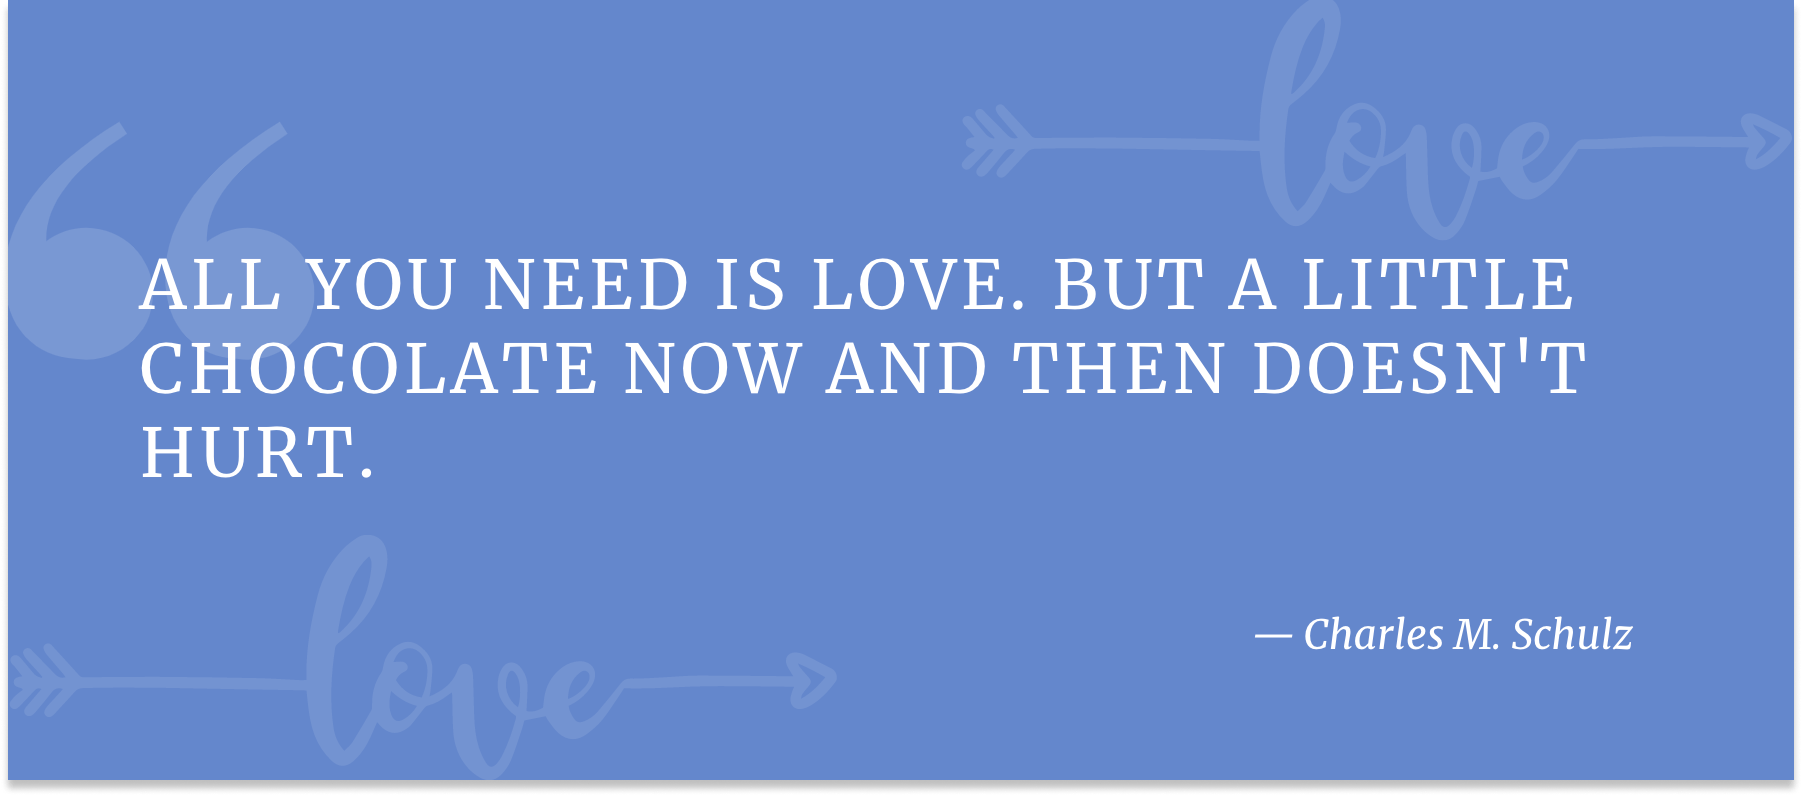 v-day quote_5 by HelpCrunch